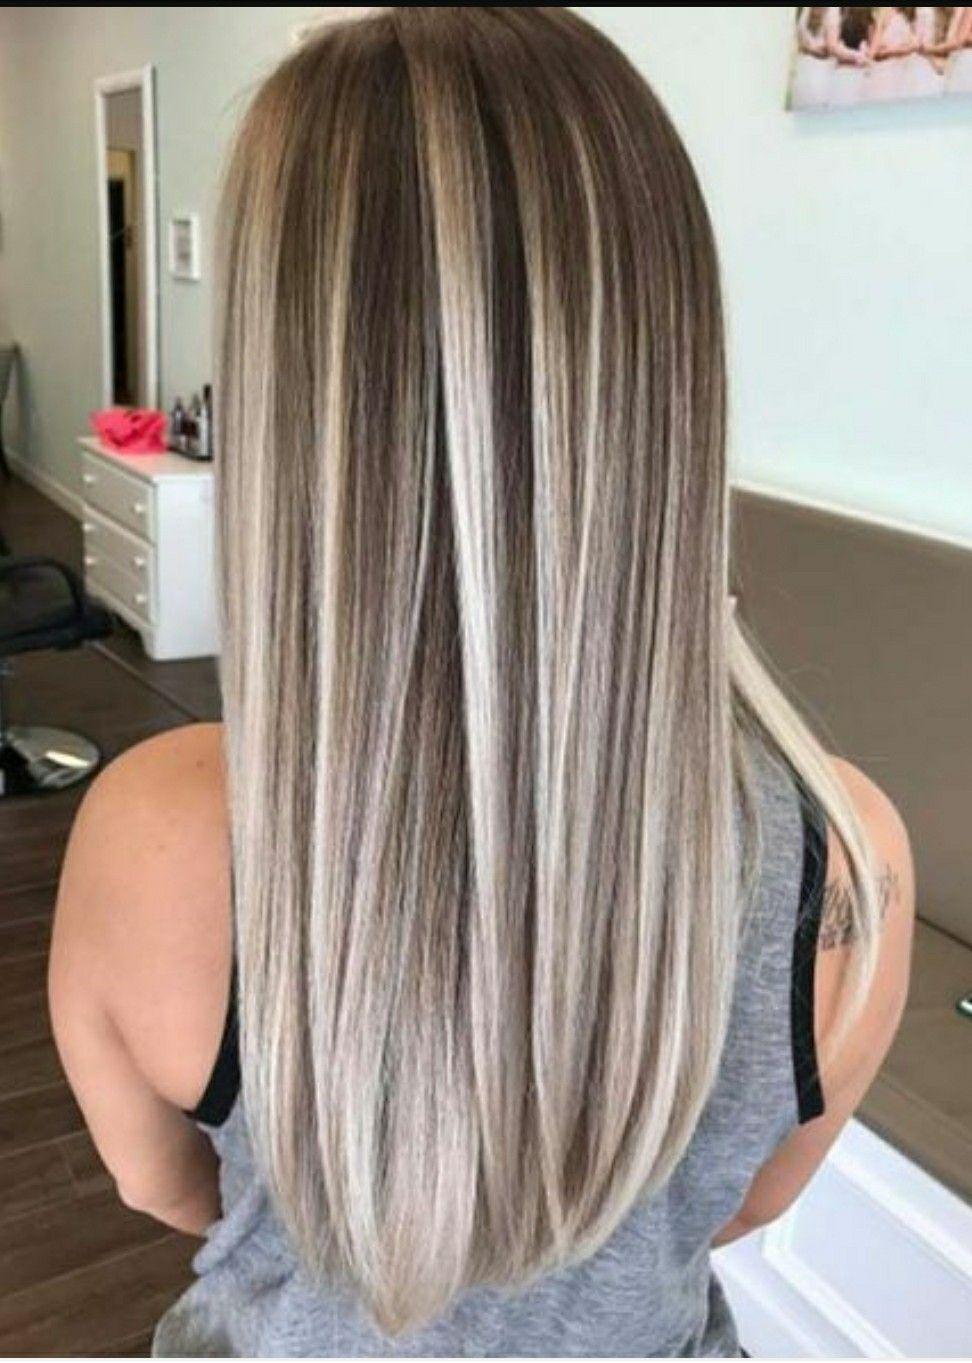 Pin by delta wyatt on hair in hair blonde hair hair styles